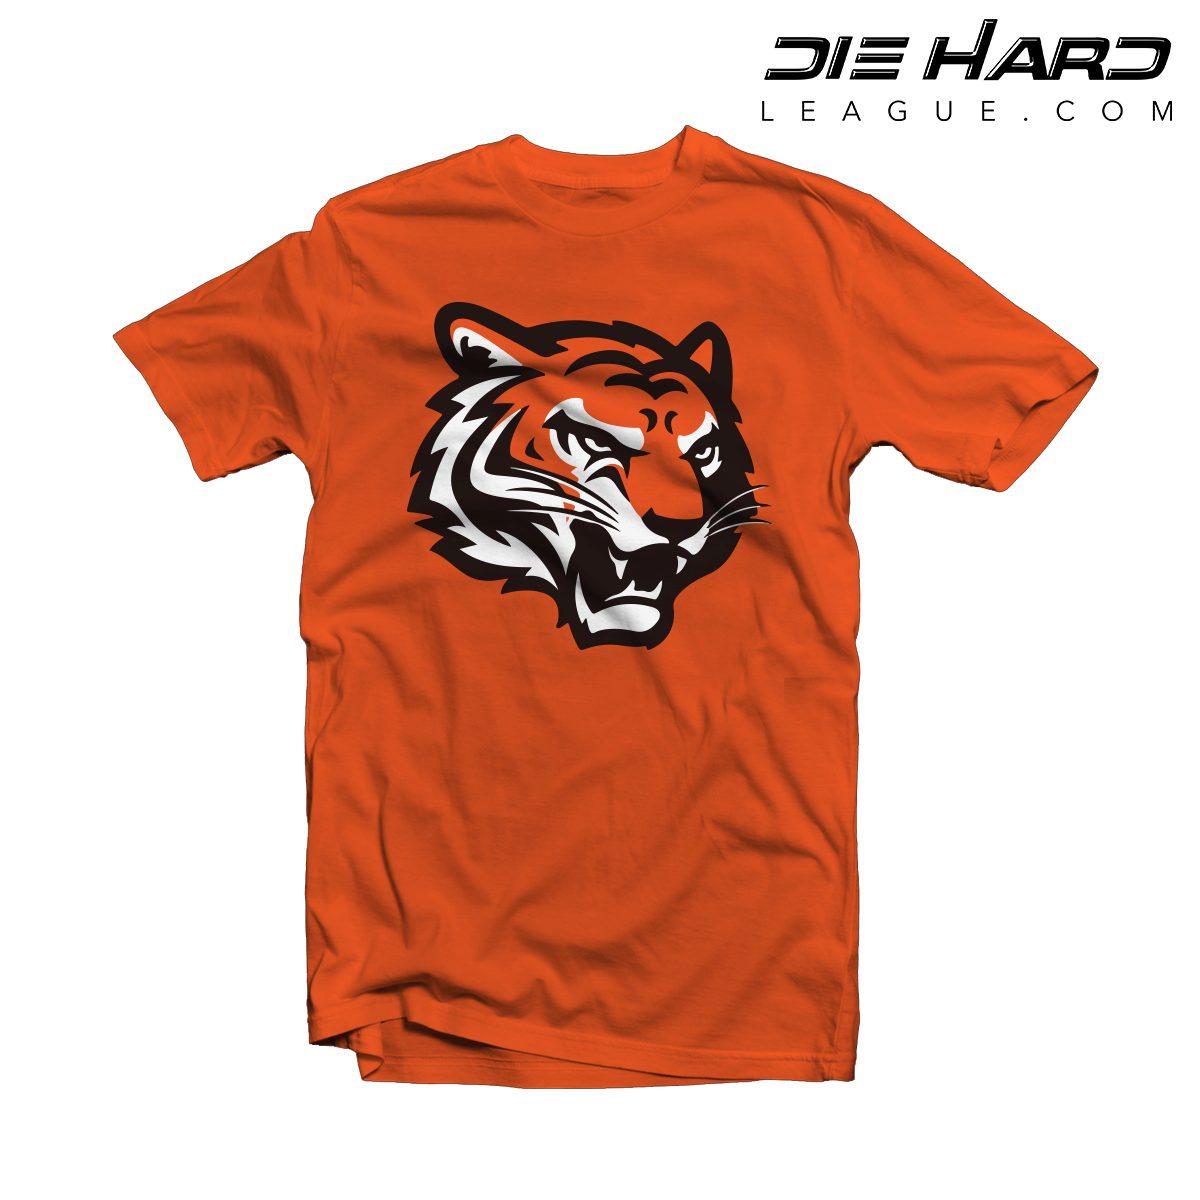 9ebfb7c3d Cincinnati Bengals Shirts - Alternate Logo Orange Tee  Fast Shipping